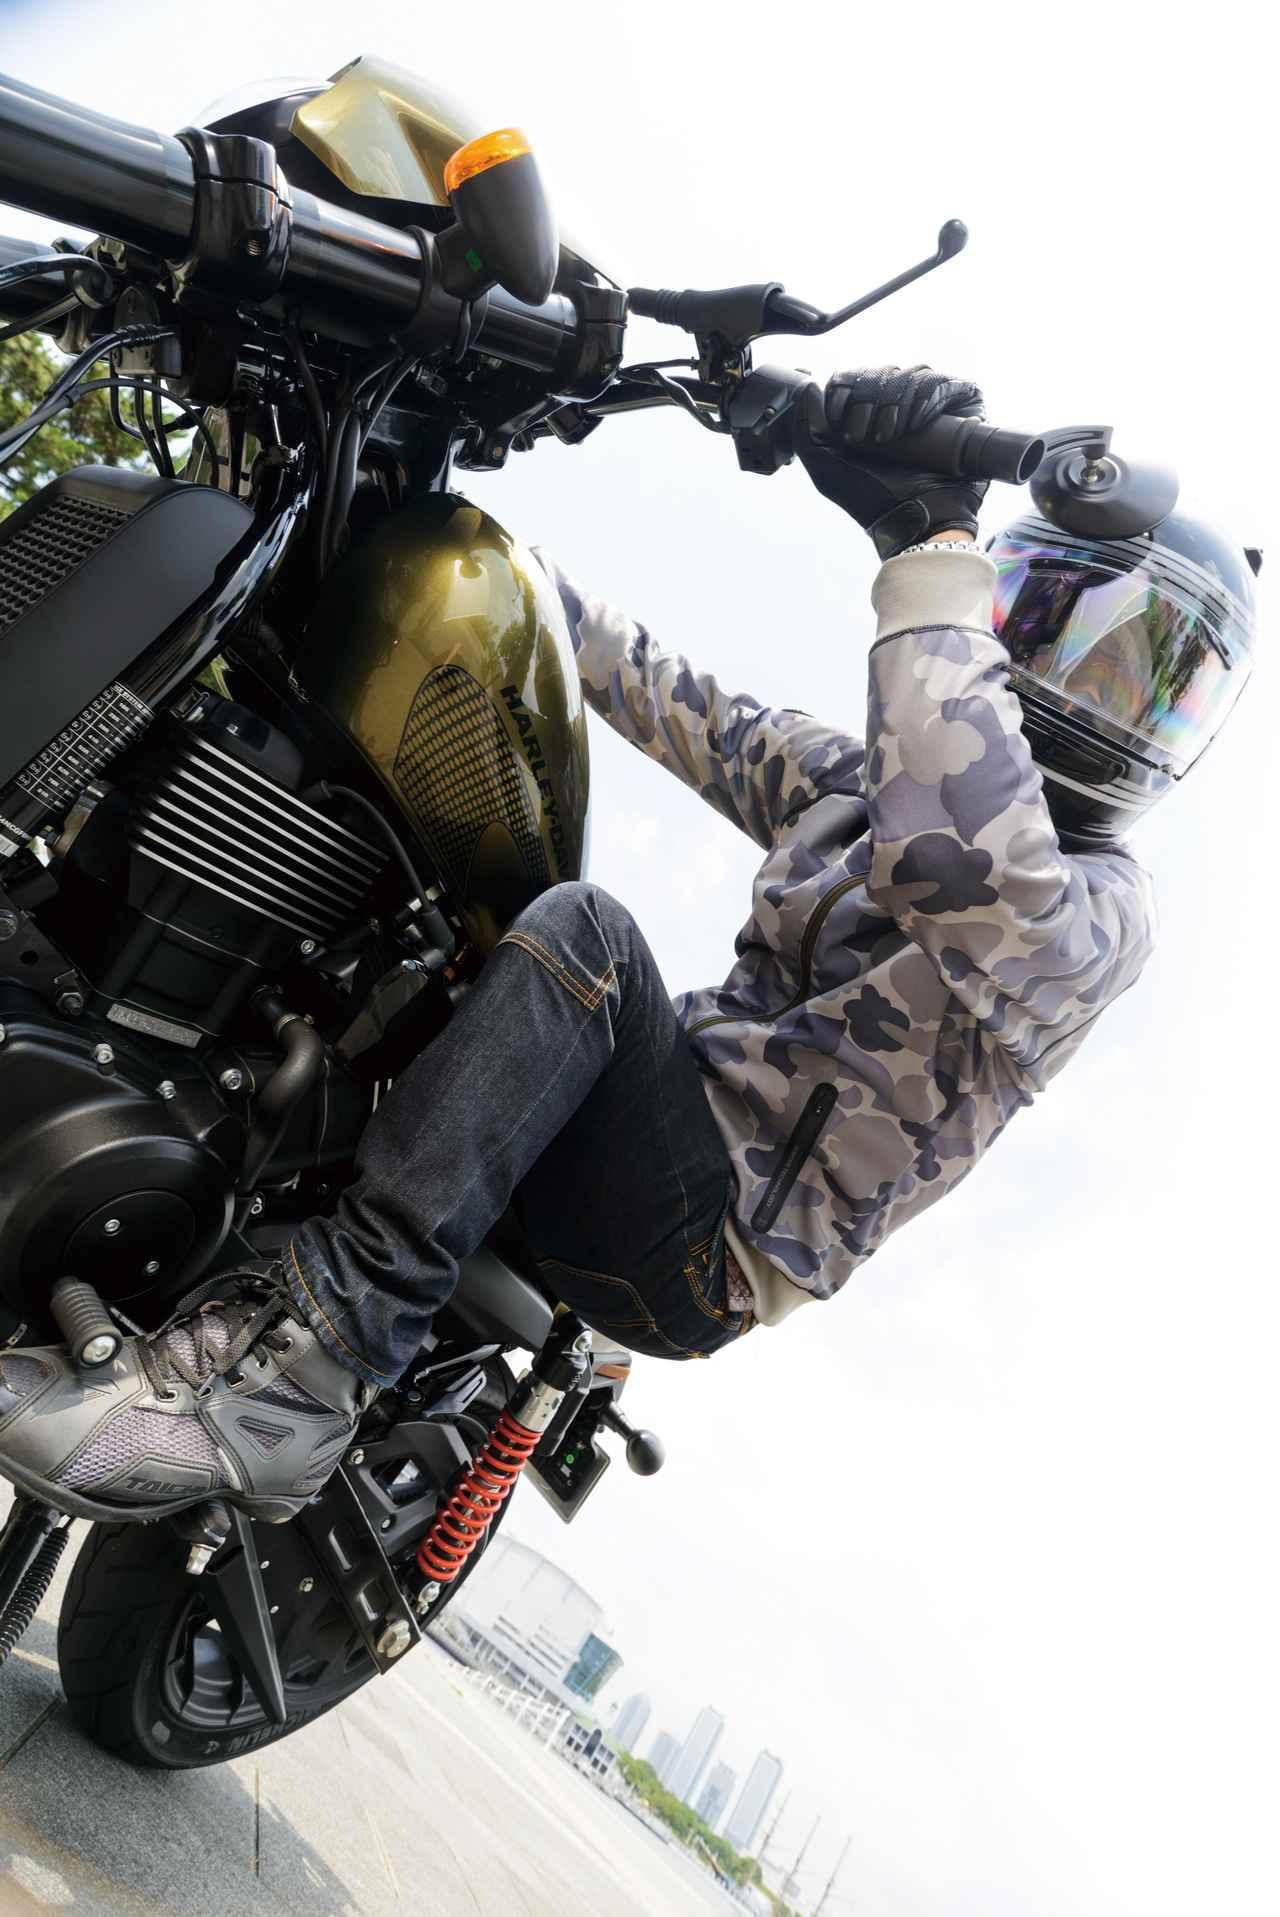 Images : 6番目の画像 - HARLEY-DAVIDSON STREET ROD[XG750A] - webオートバイ